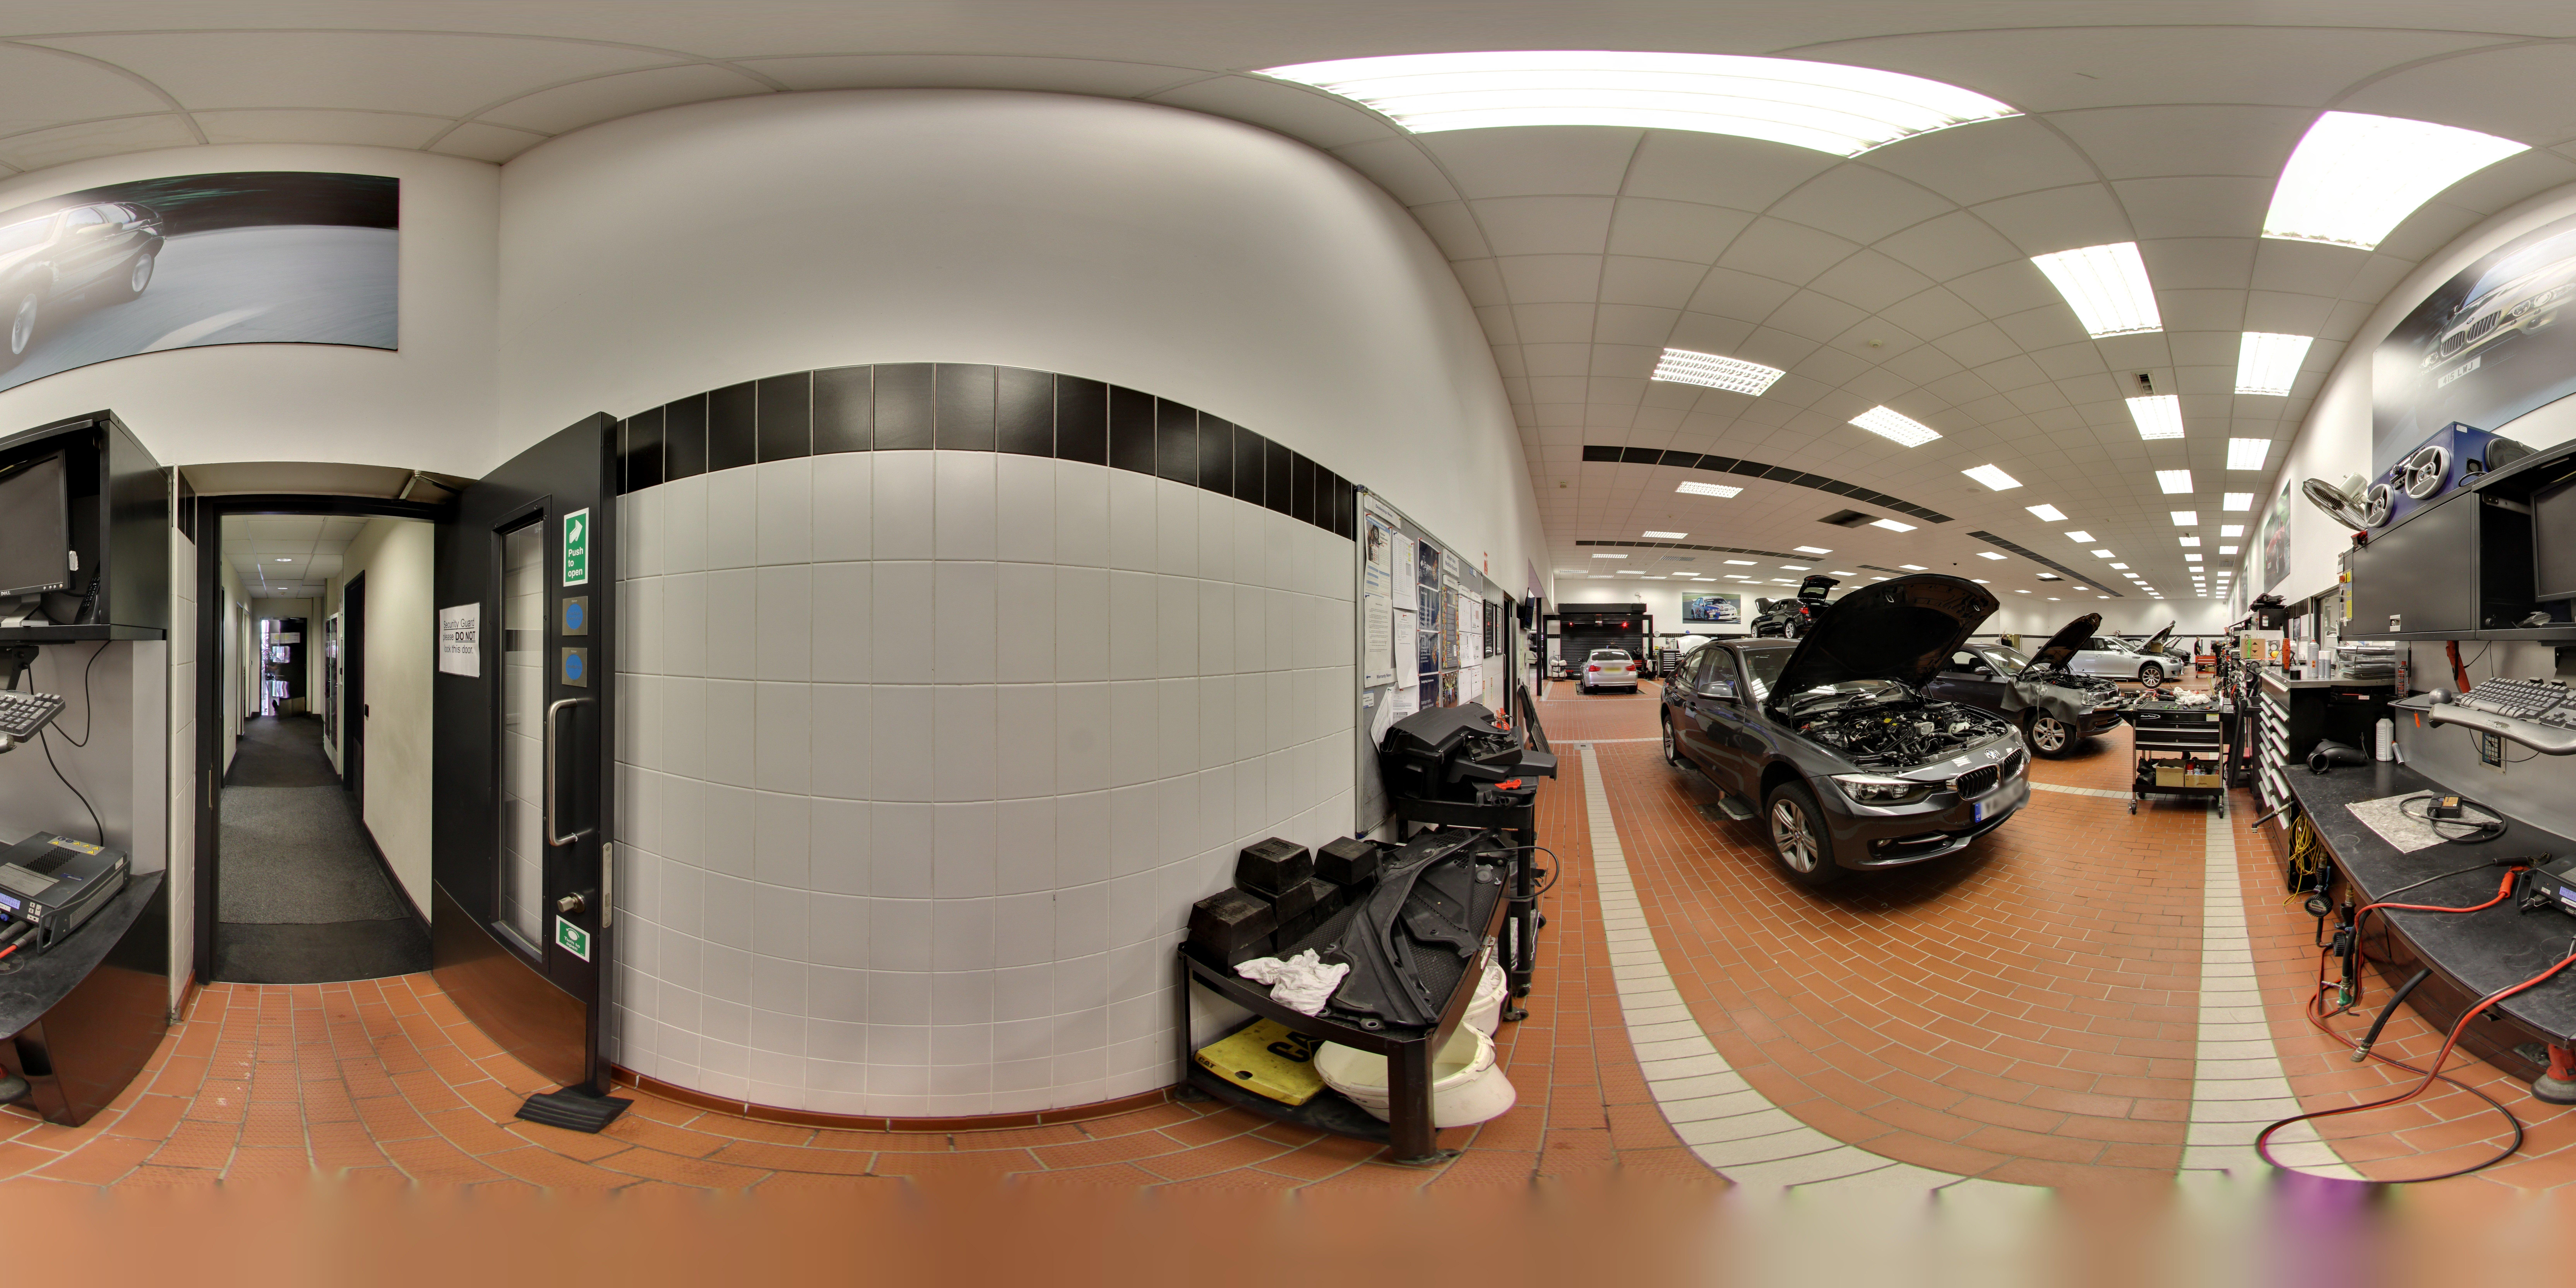 Sytner Chigwell BMW Loughton 020 8418 7600